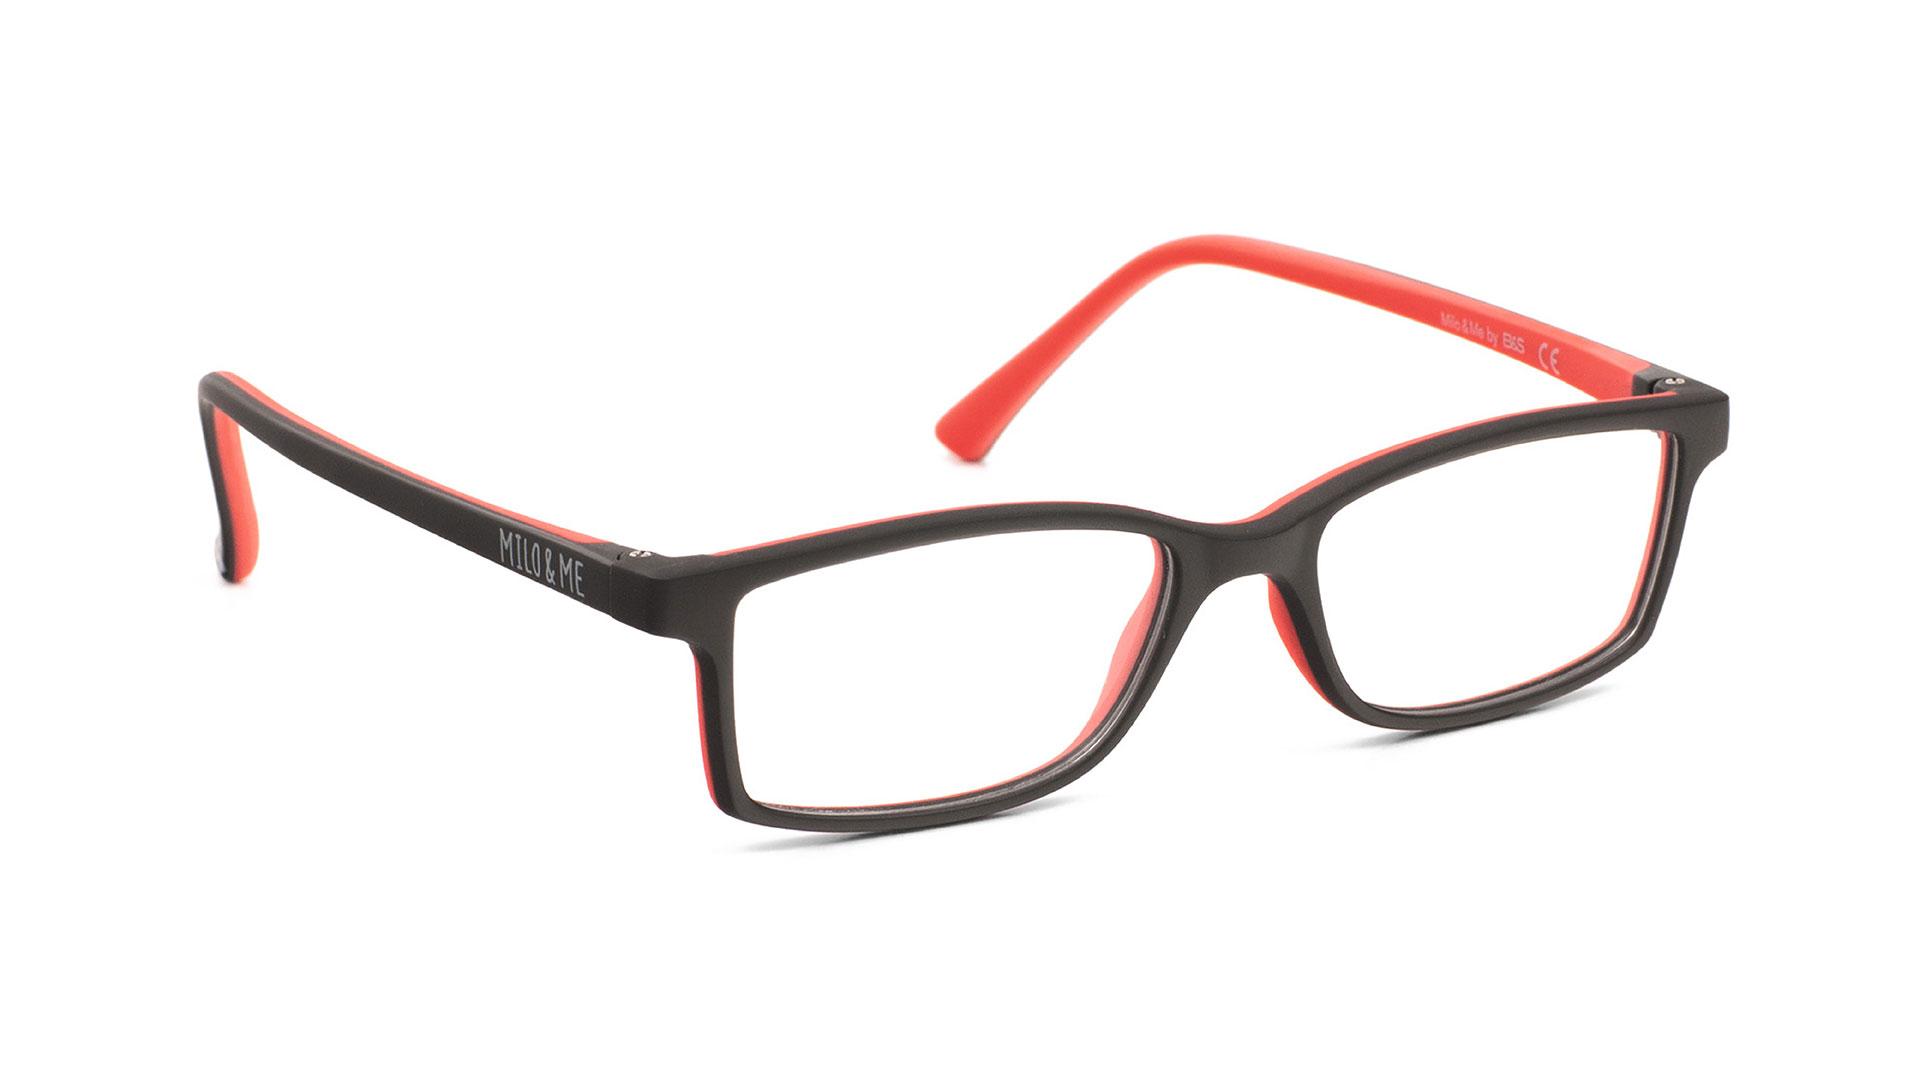 BlackRed H85011-13 - Milo & Me Eyewear - Optimum RX Lens Specialists